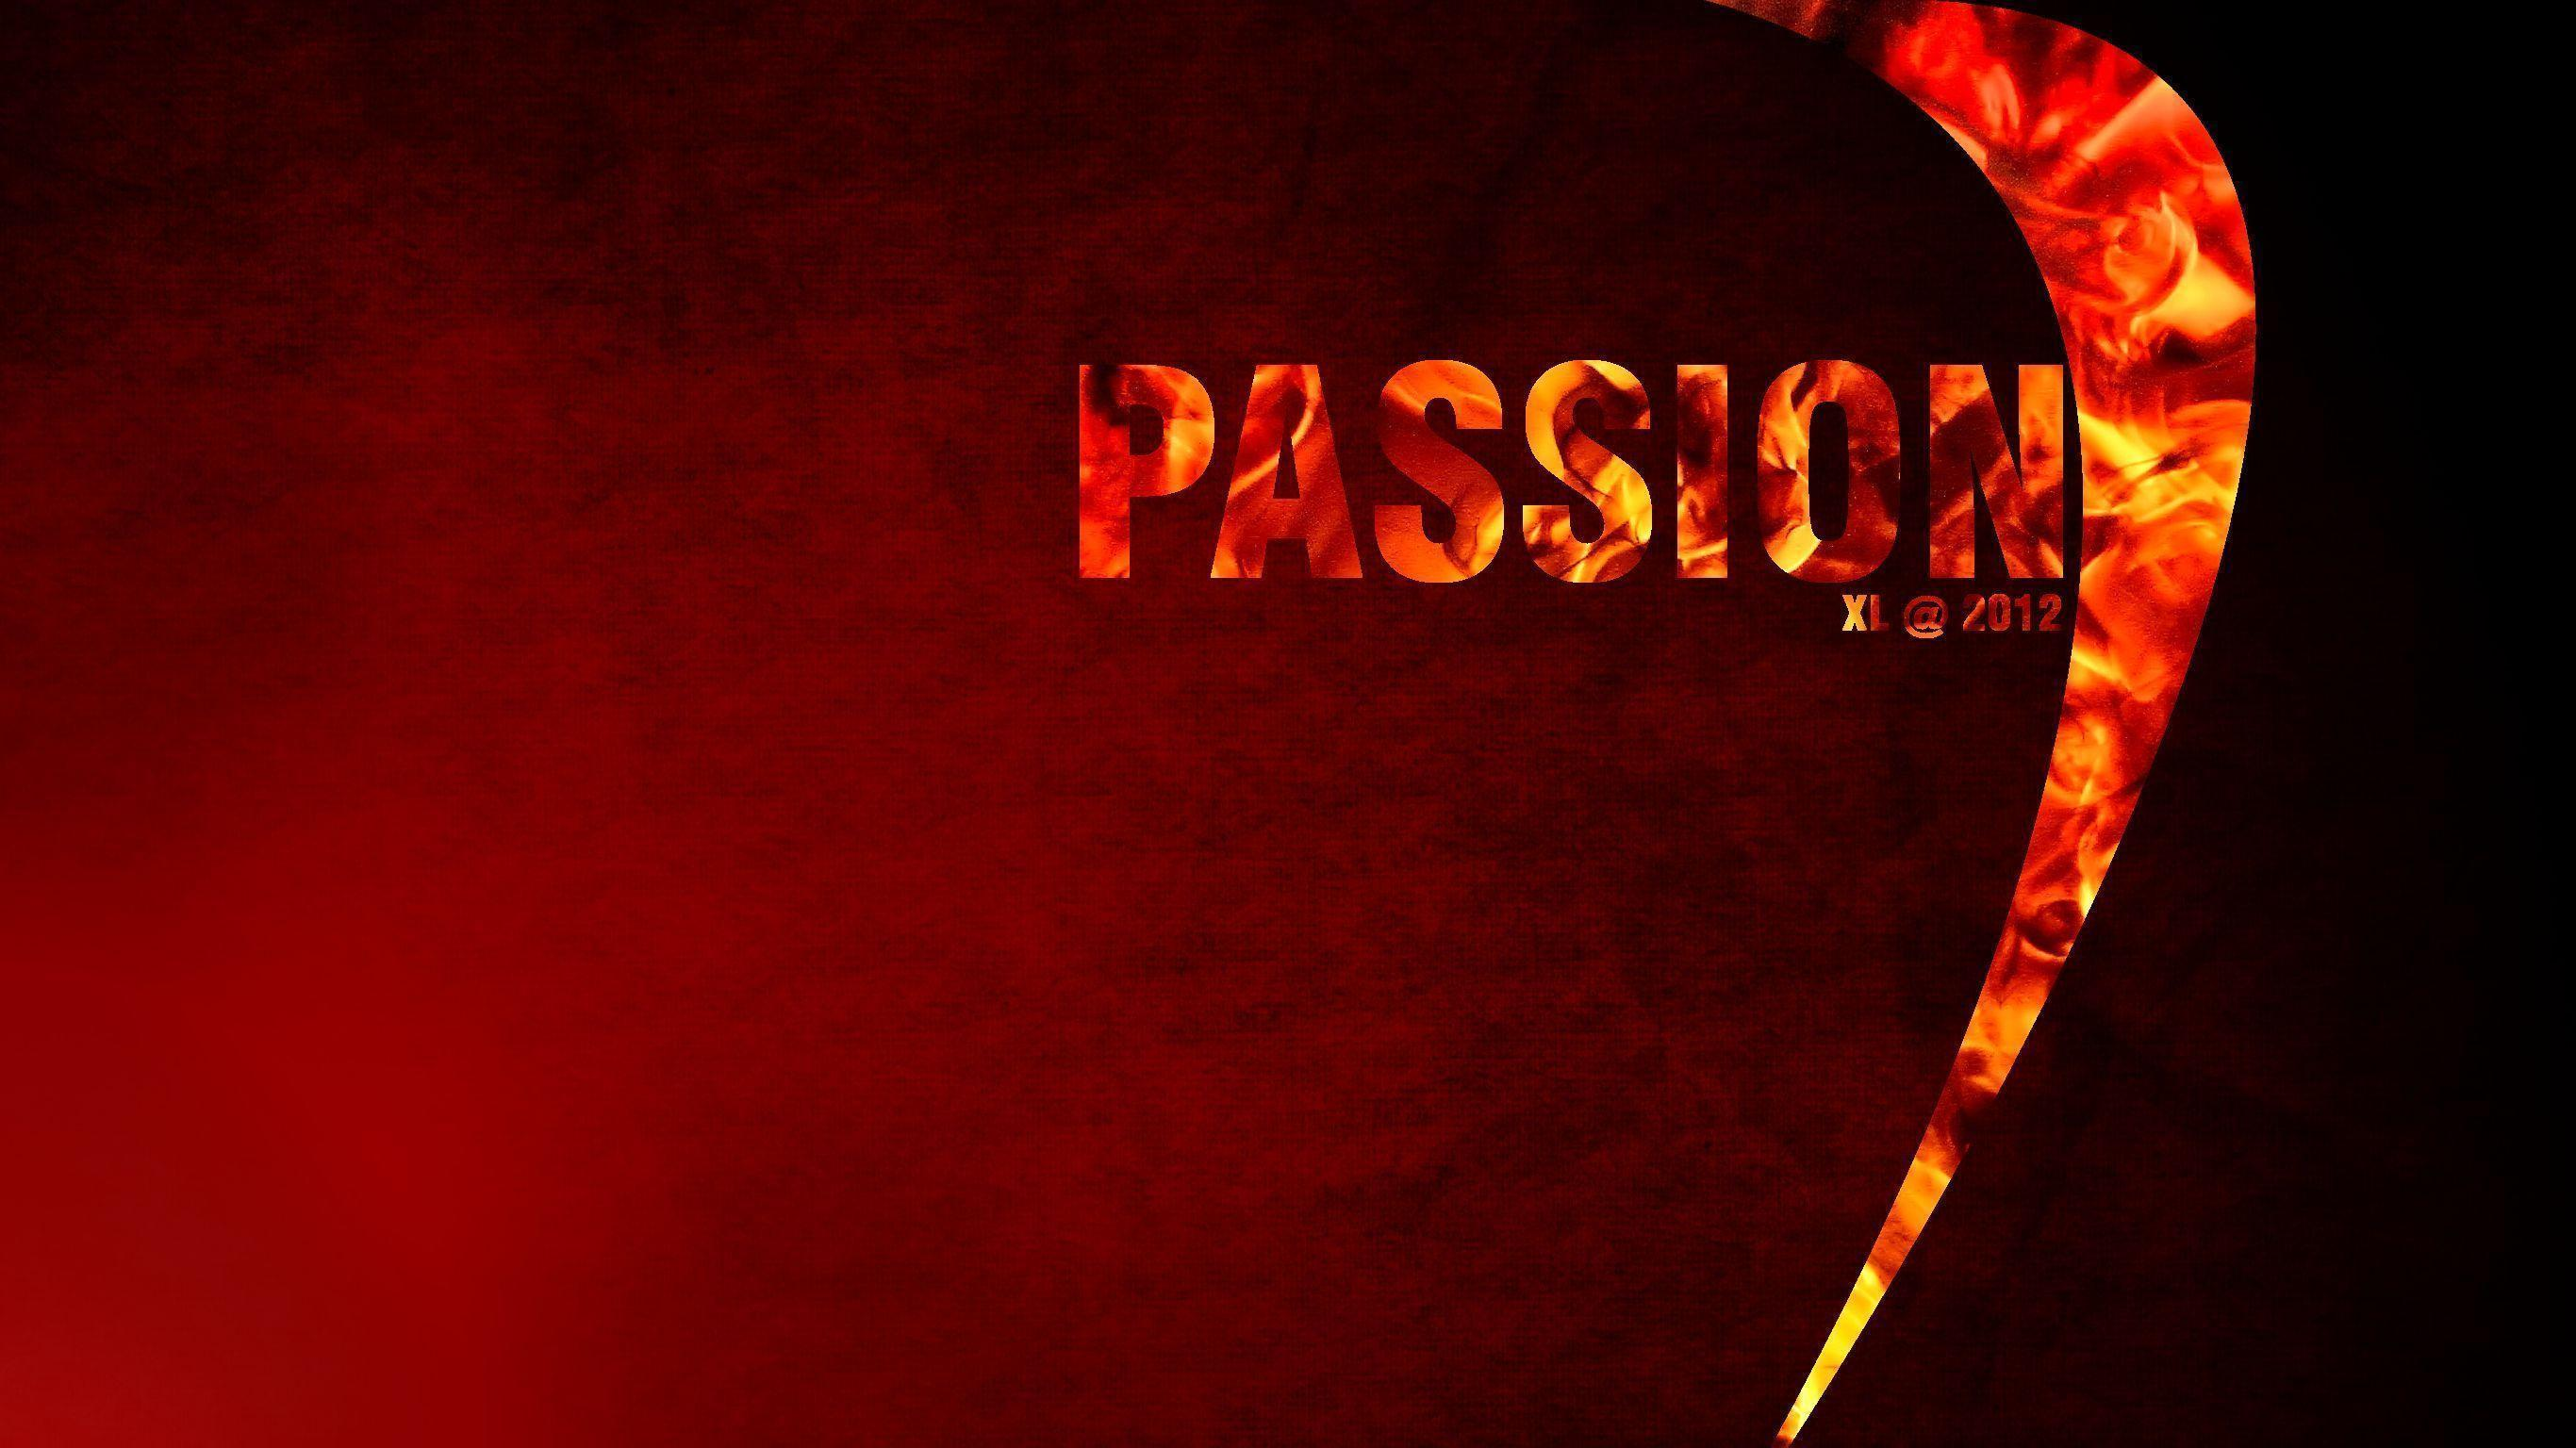 passion wallpaper forwallpapercom - photo #18